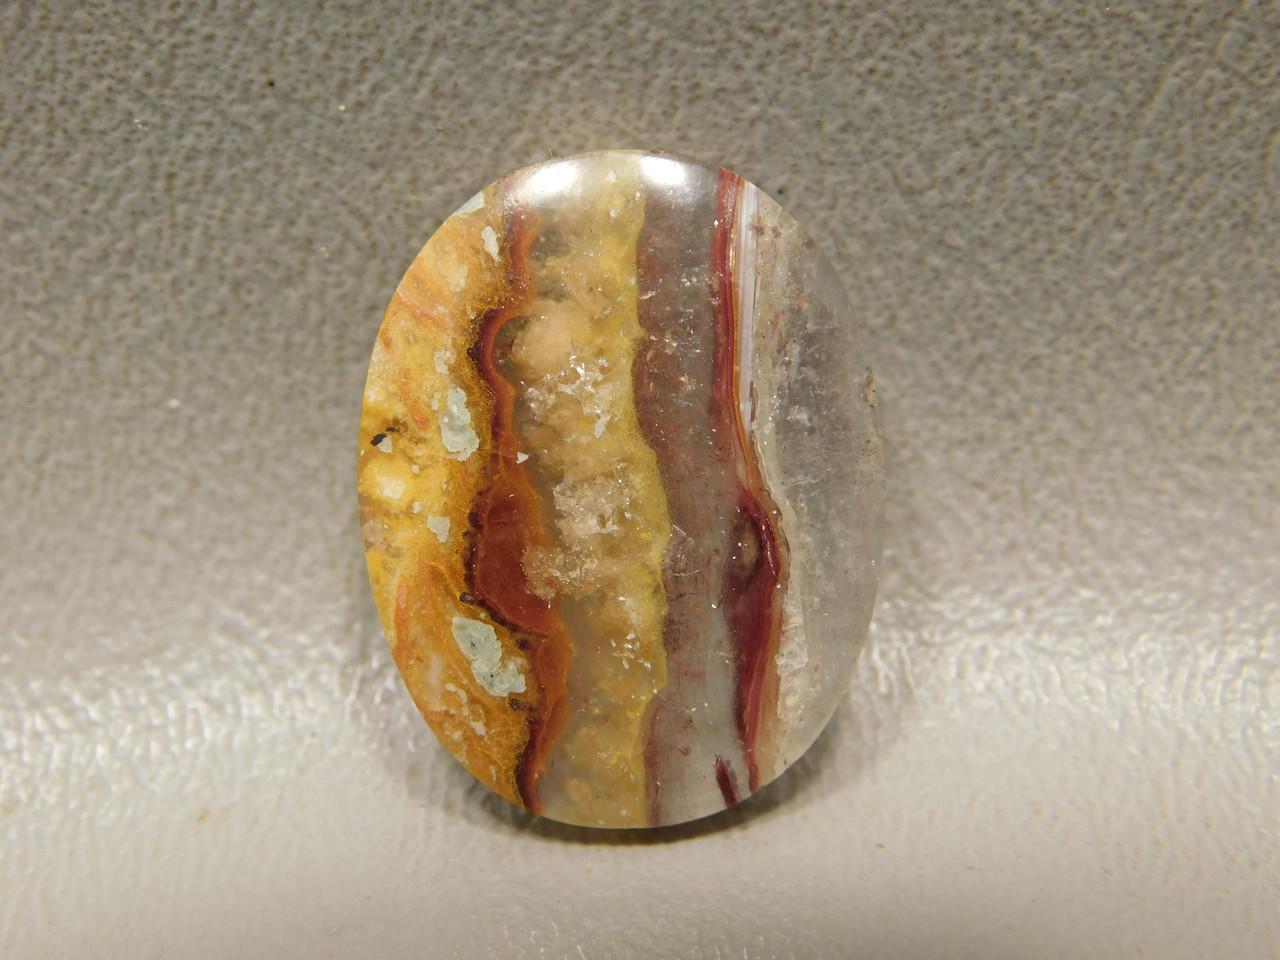 Candy Opal Striped Bacon Opal Gemstone Cabochon Stone #16